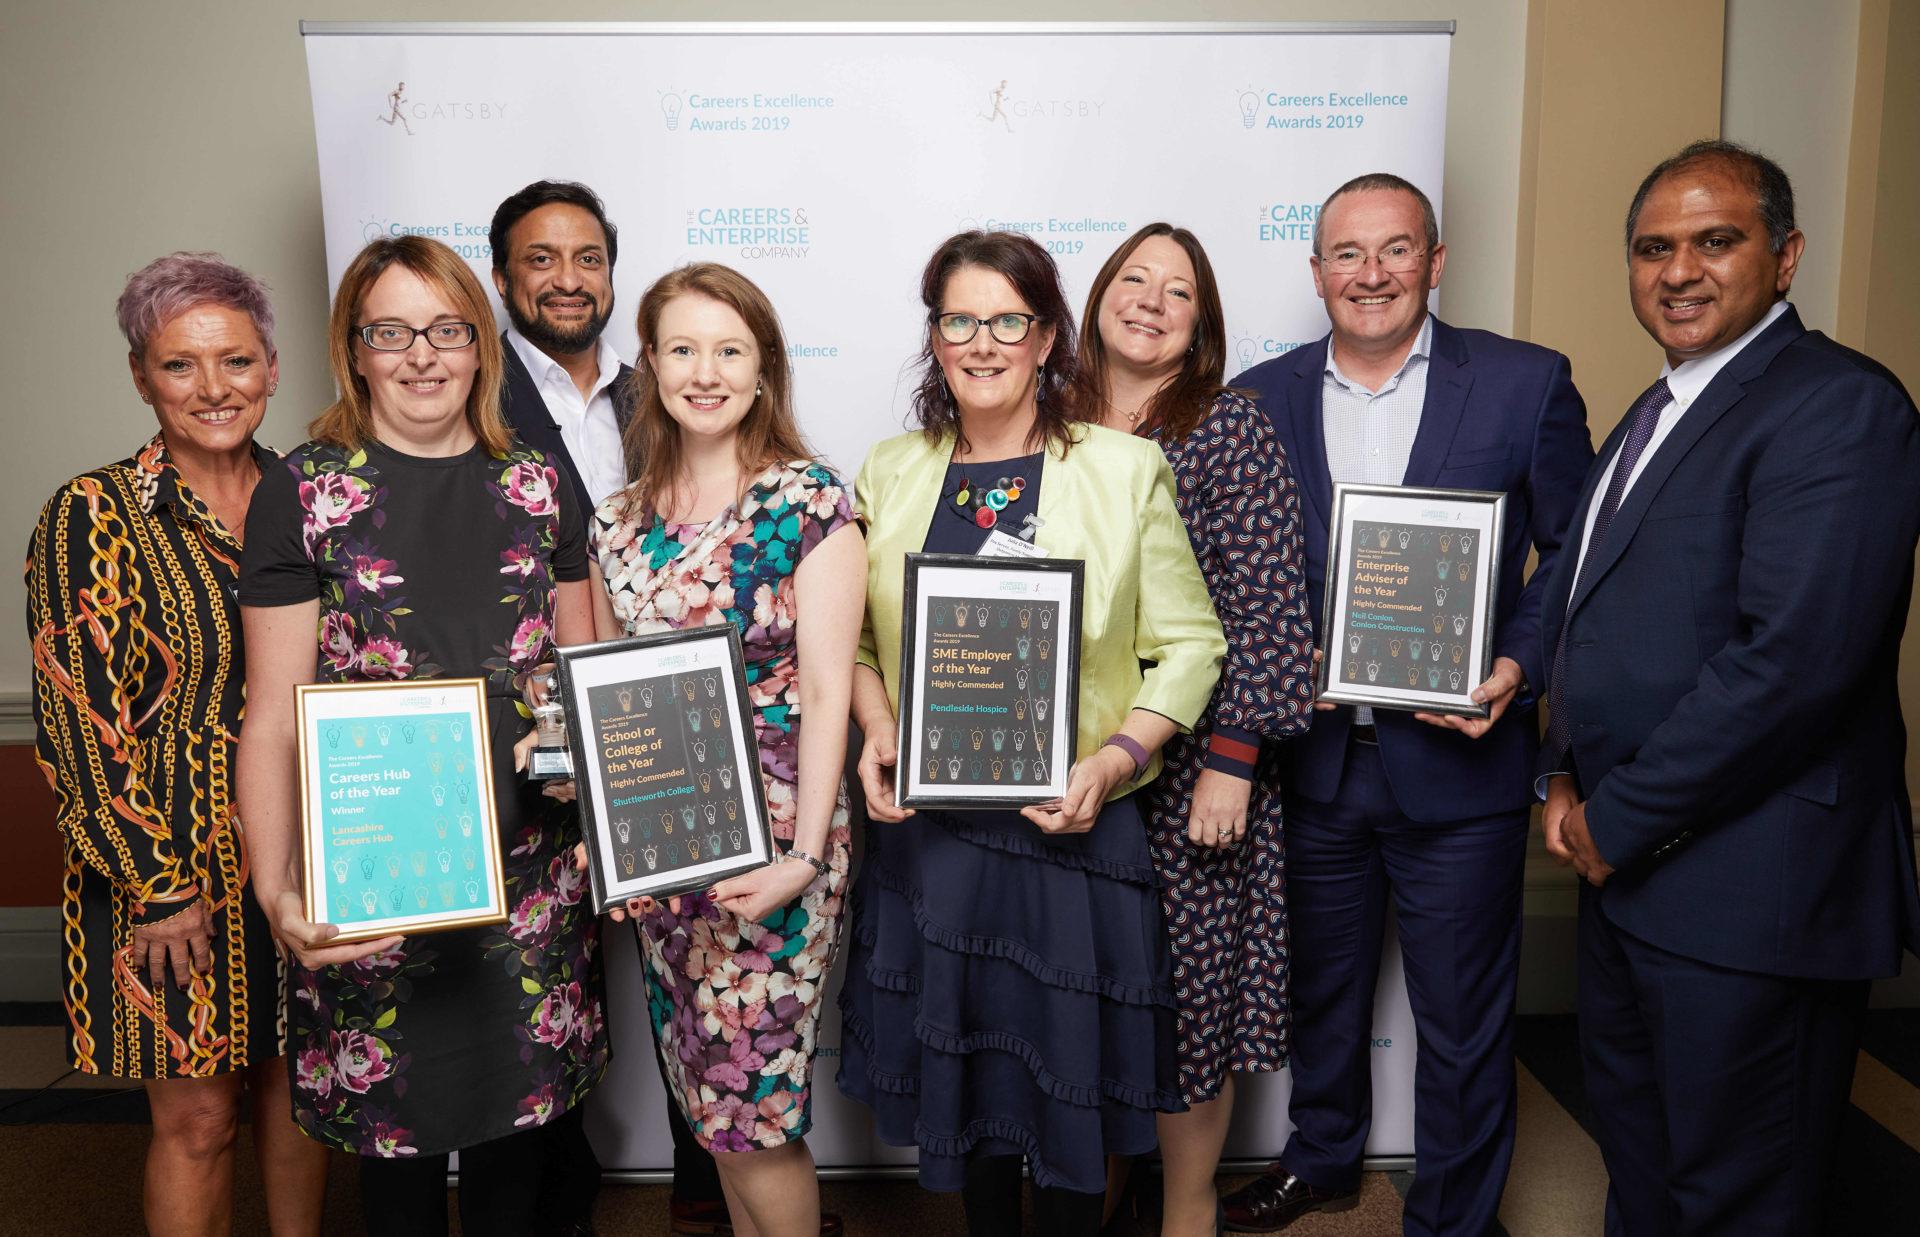 Lancashire delegation with awards